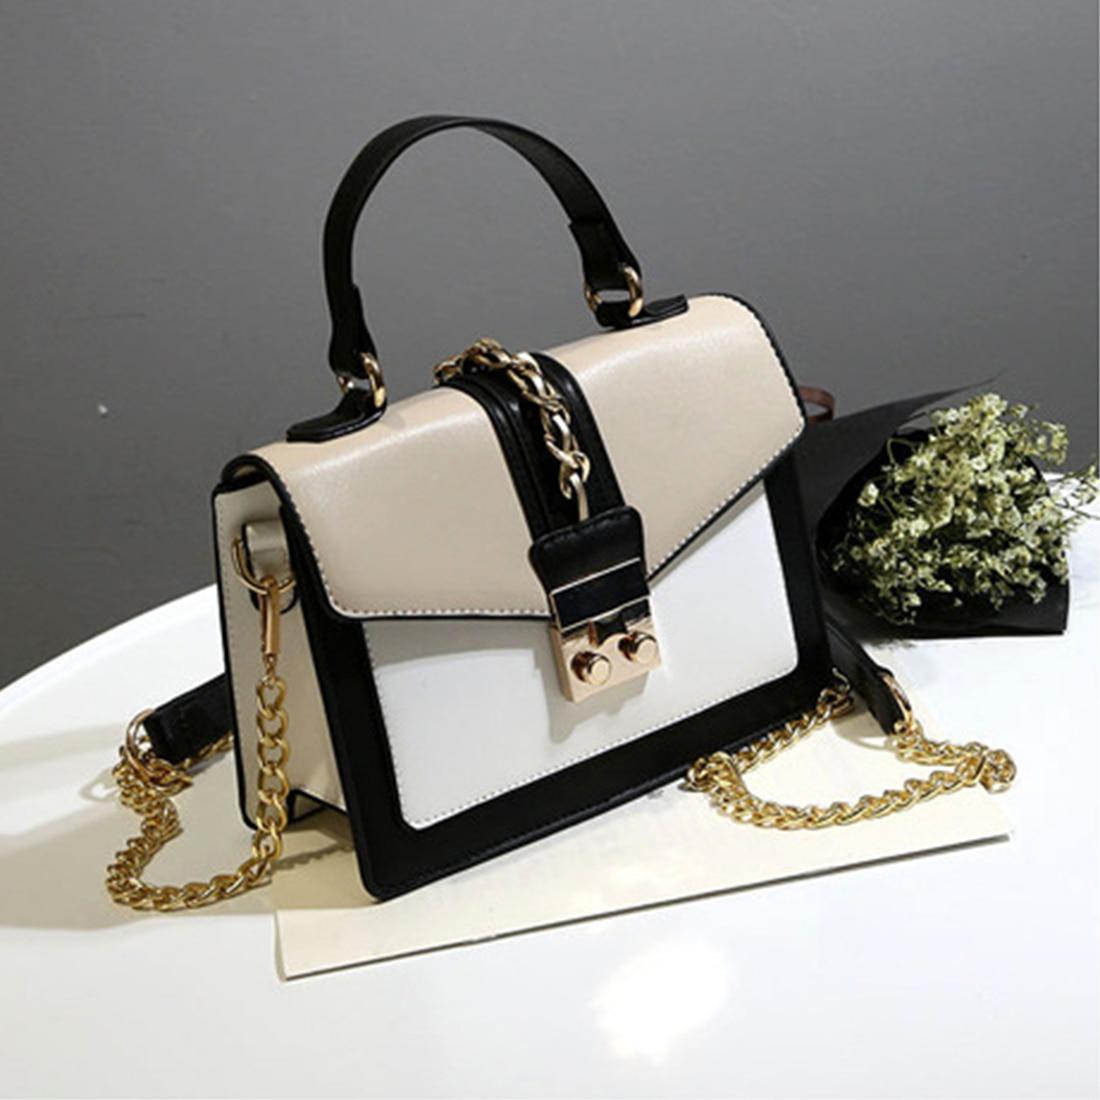 SFG FASHION Flap Women Messenger Bag Chain Strap Lady Work Shoulder Bags Luxury Handbag Women Bags Street Cross Body Bags